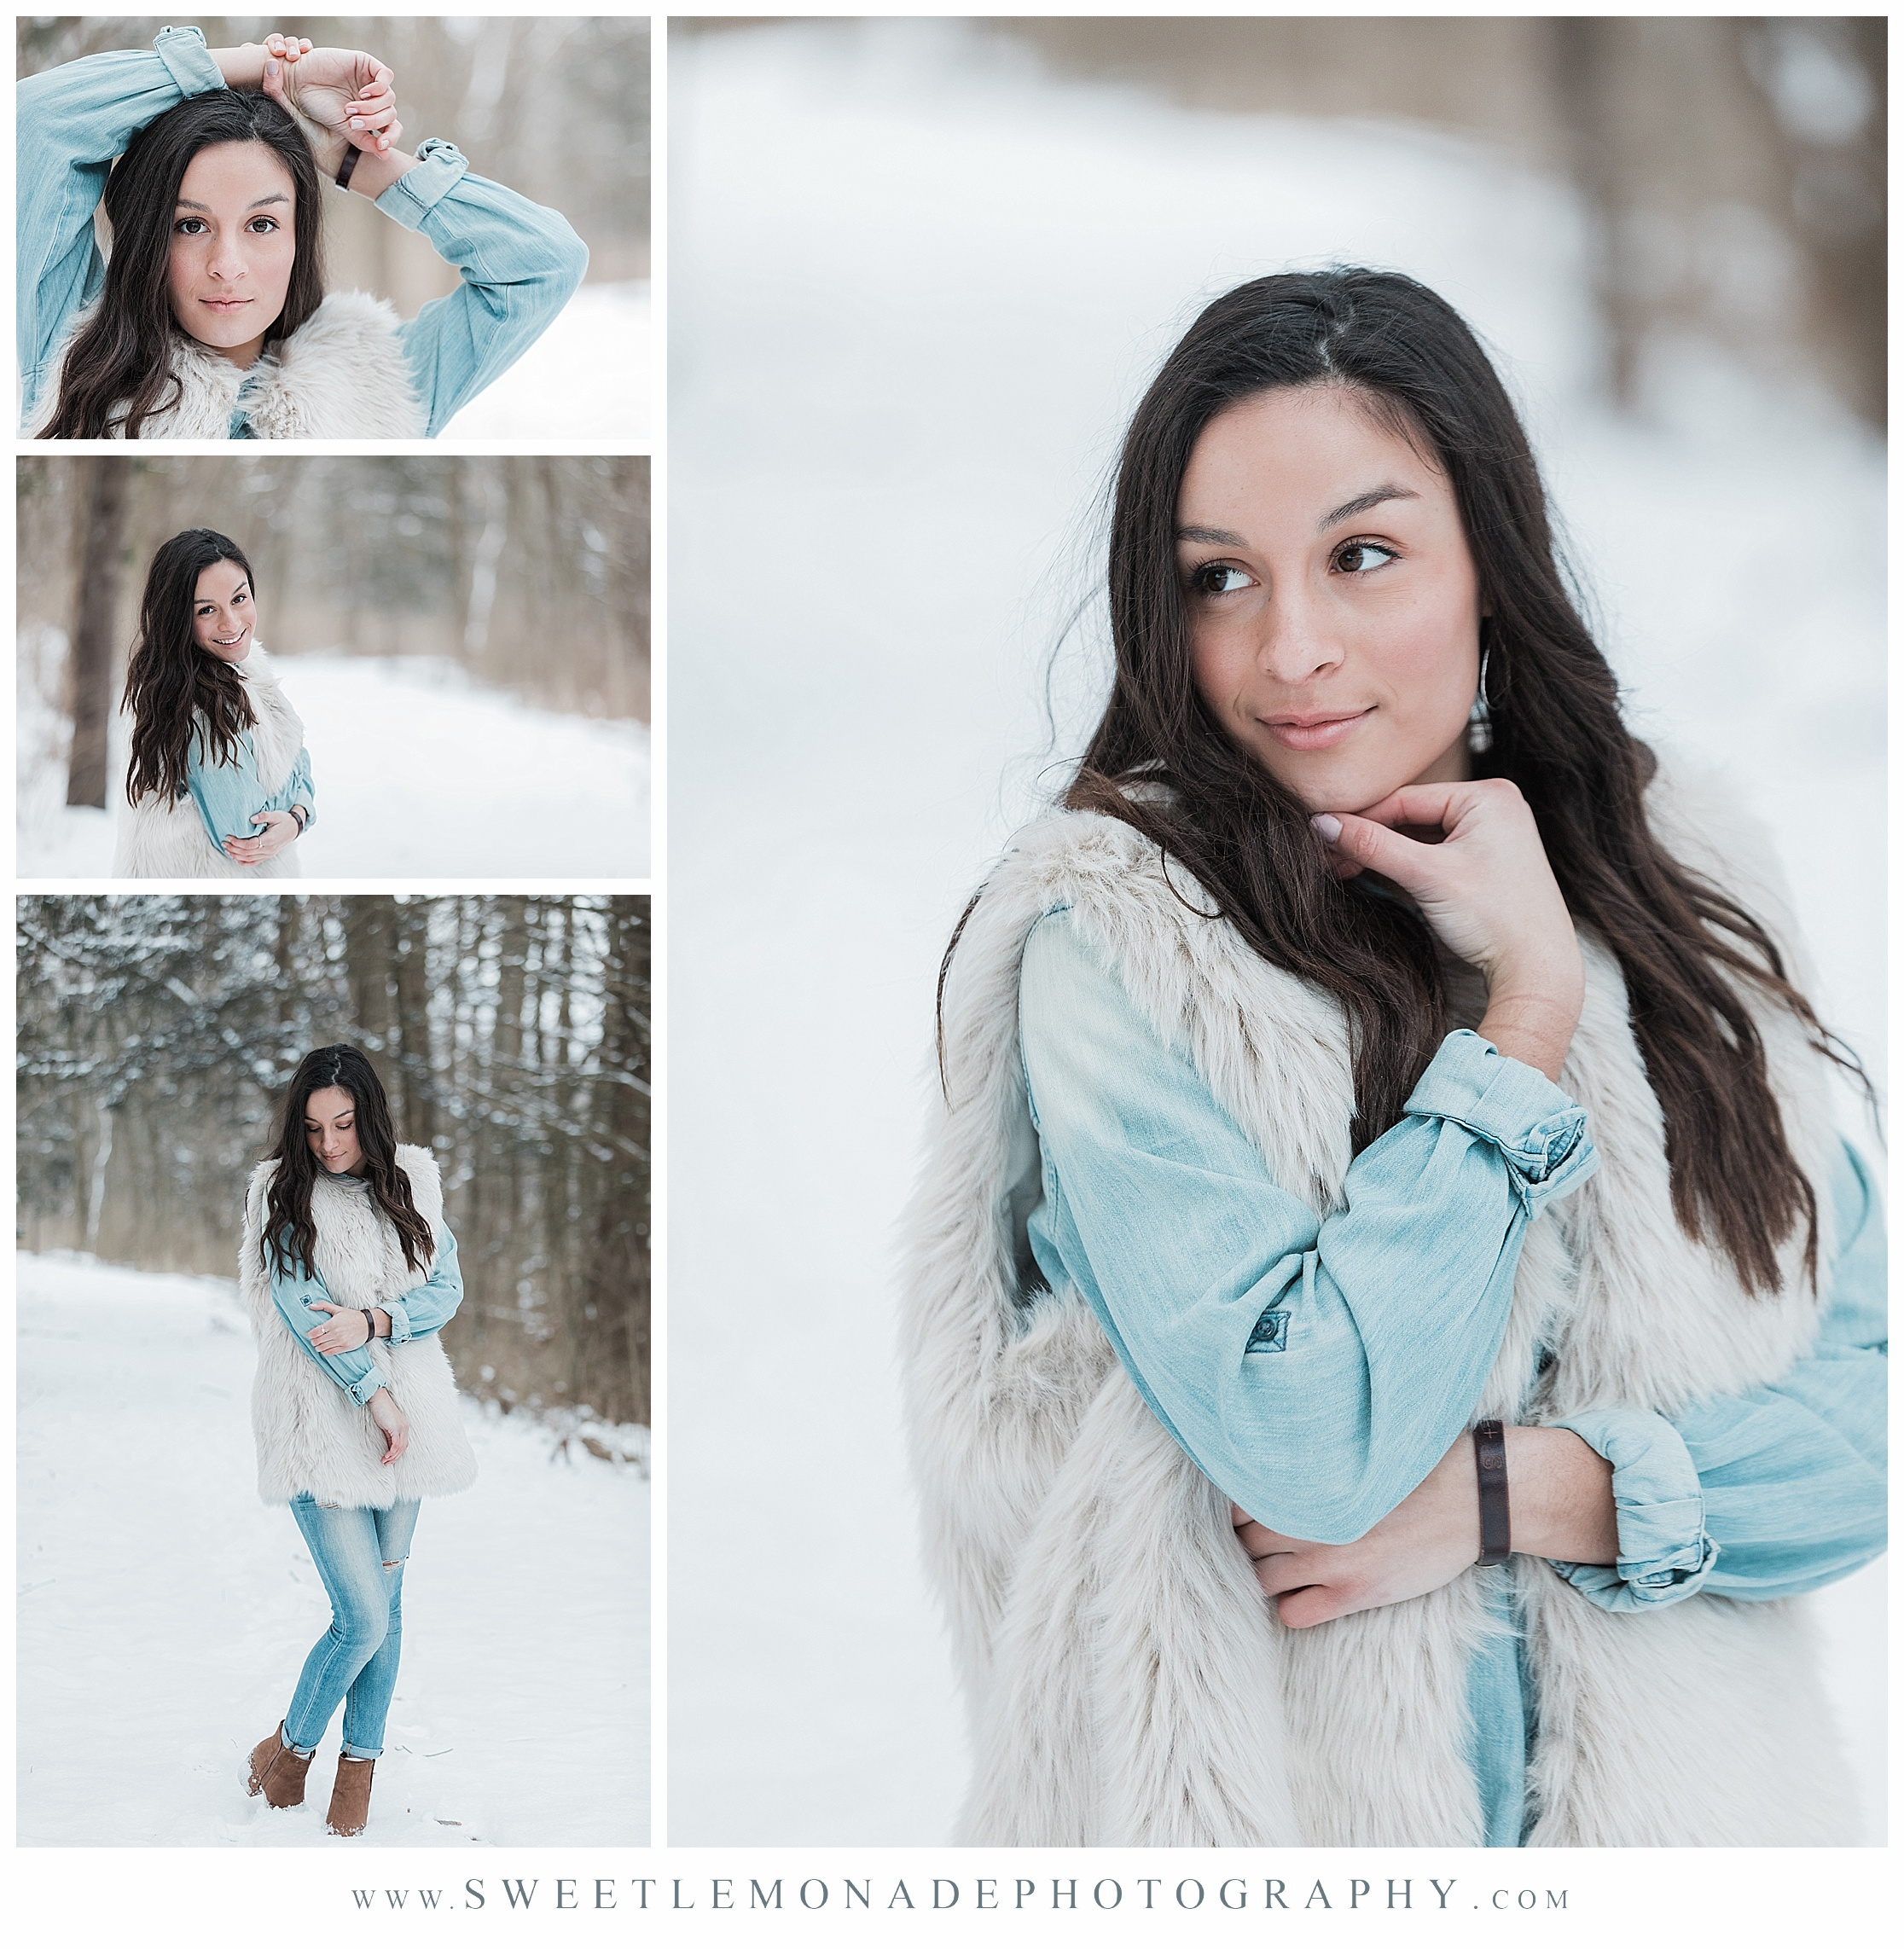 champaign-illinois-snow-senior-pics-winter-sweet-lemonade-photography_2076.jpg